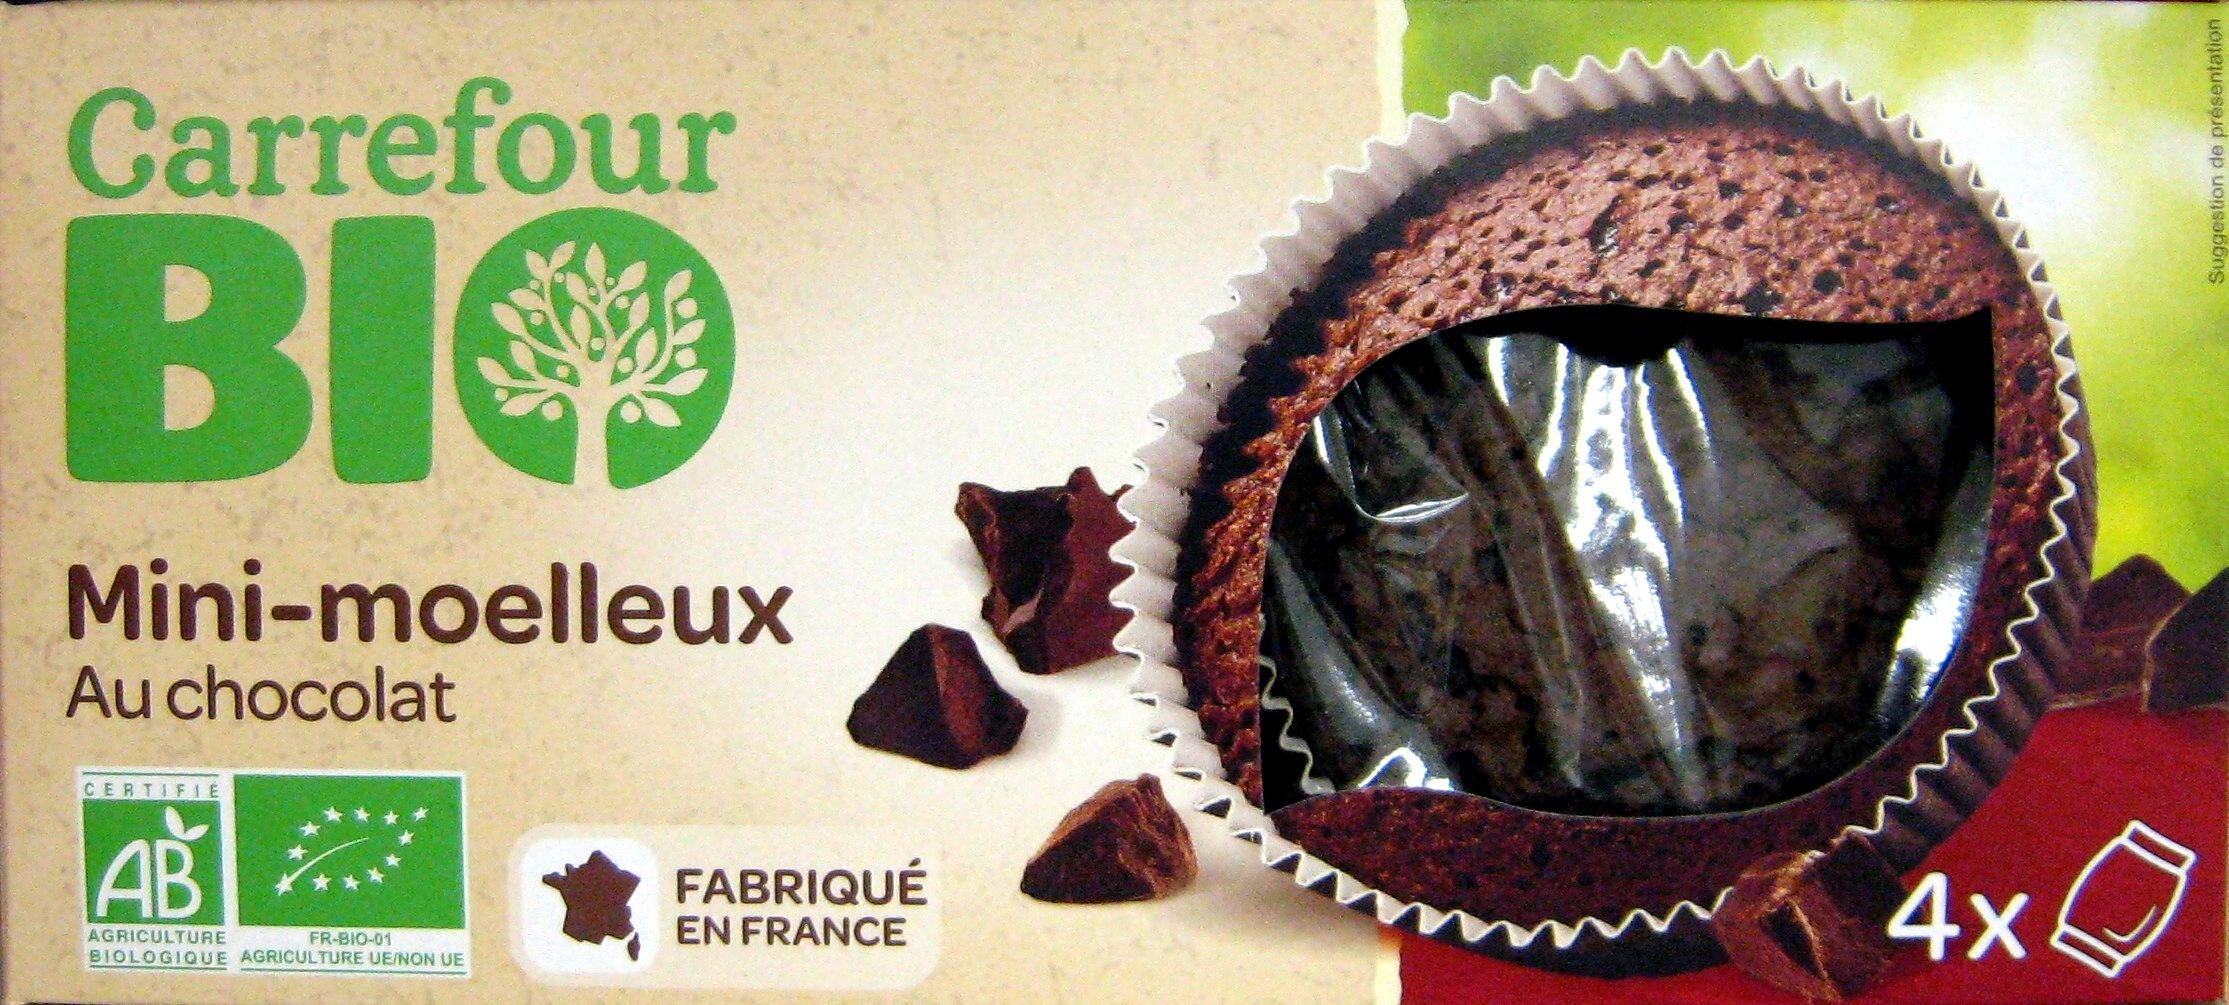 mini moelleux au chocolat carrefour 200 g 4 x 50 g. Black Bedroom Furniture Sets. Home Design Ideas